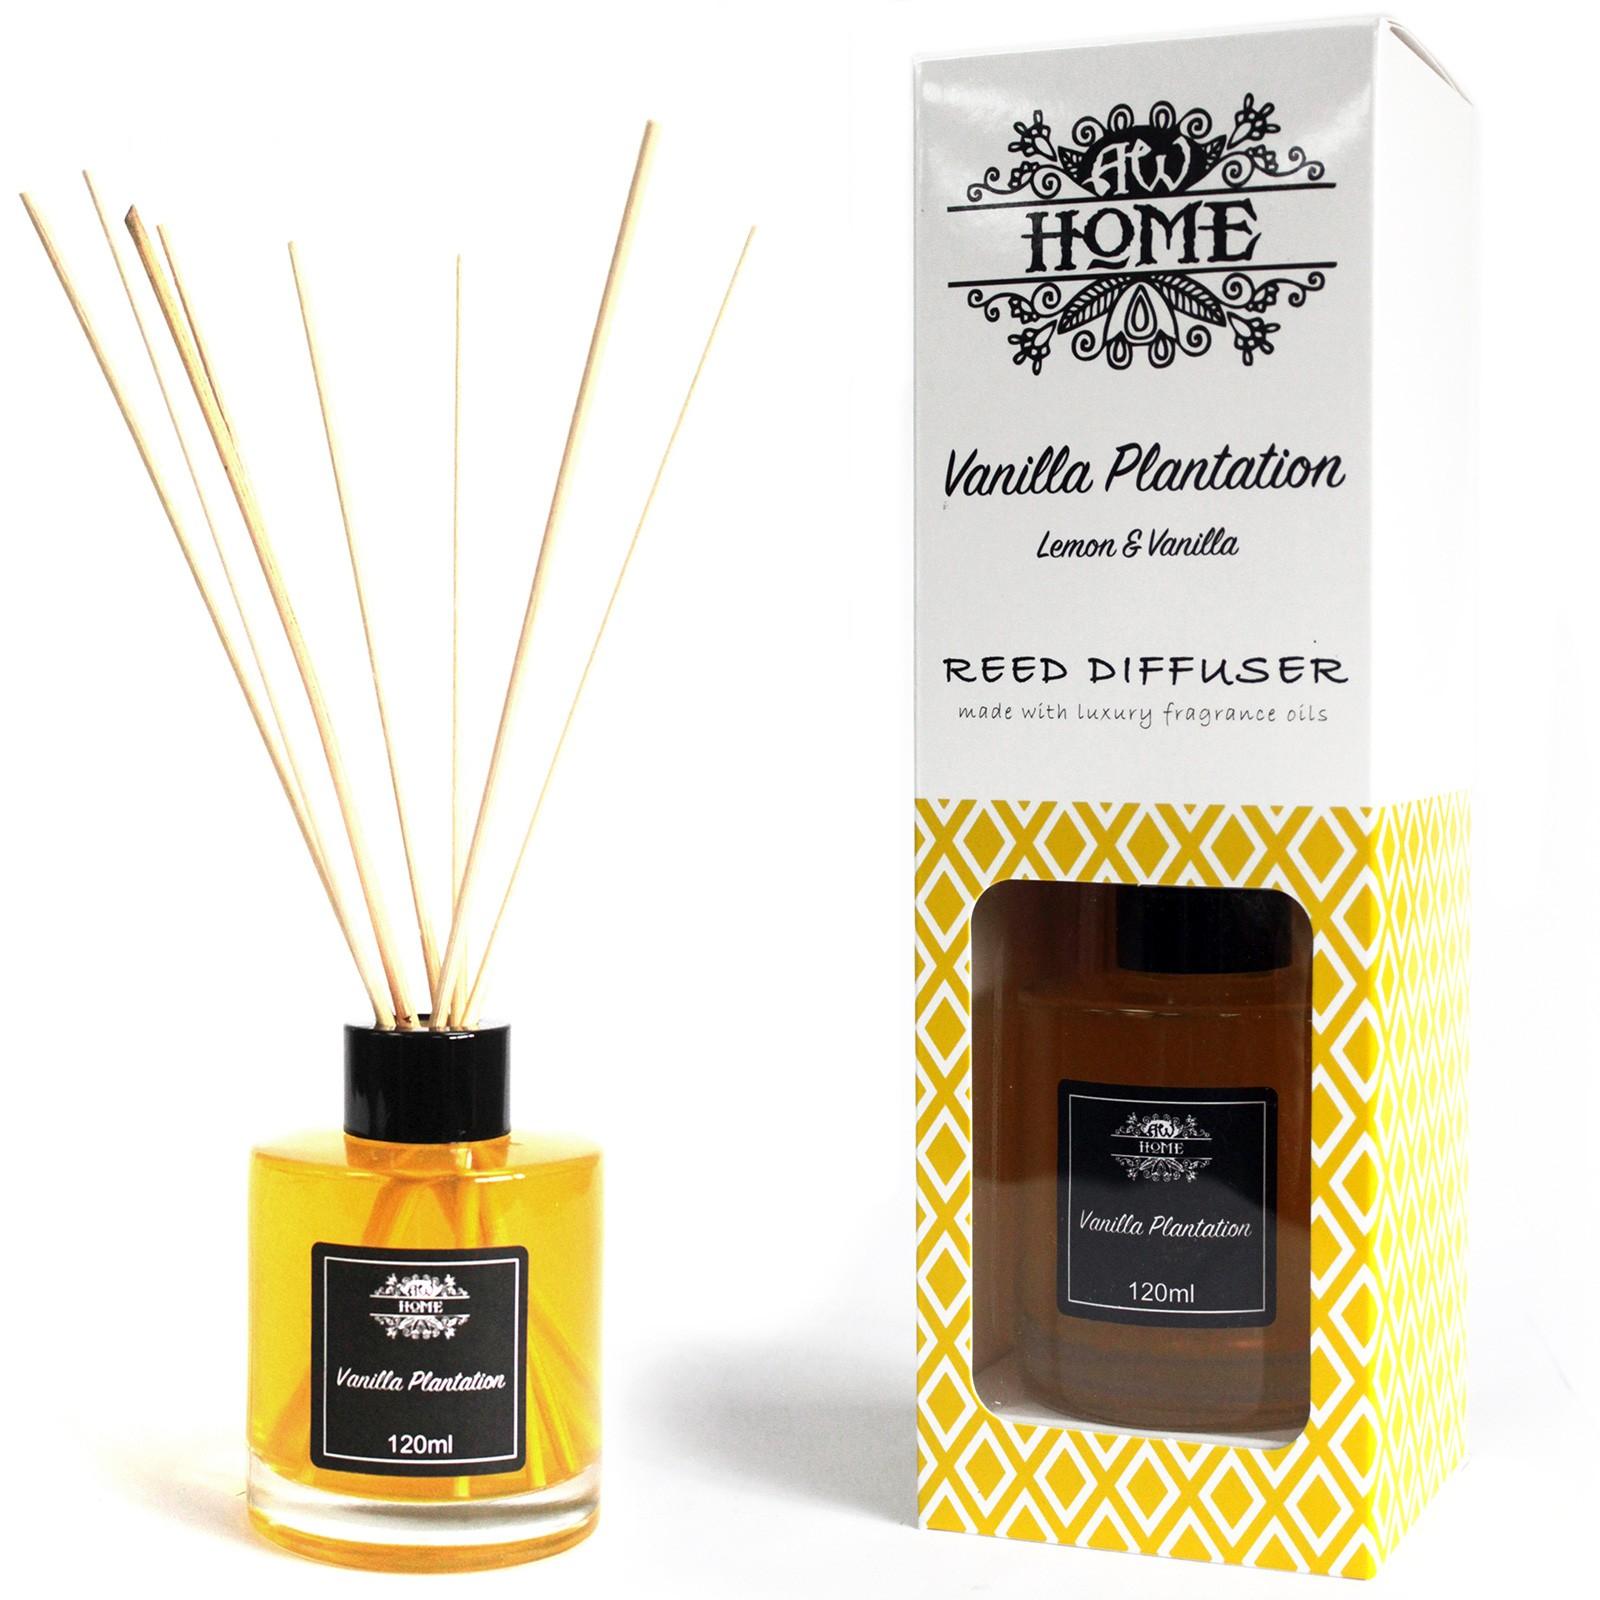 120ml Reed Diffuser Vanilla Plantation